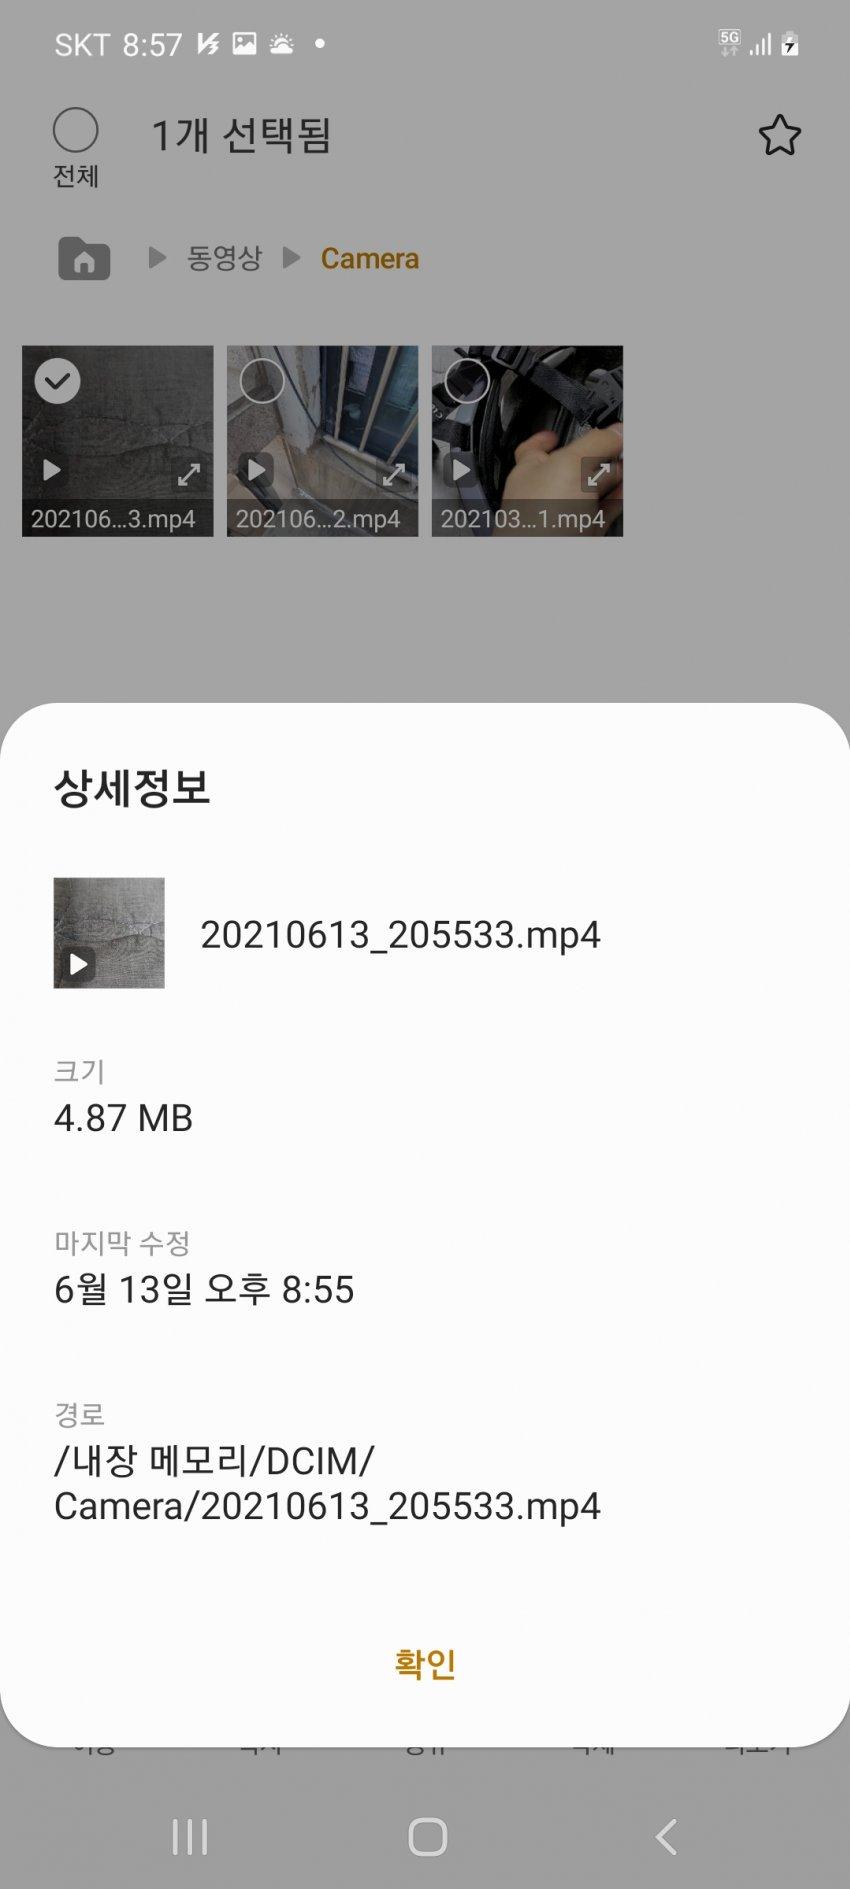 viewimage.php?no=24b0d769e1d32ca73dec8efa11d02831b210072811d995369f4ff39c9cd24d83cad2d14c13765fcecfbea339c481994e07864a708006210245aff167bc0b8632e2e56106e5d381620d2f38f8a37a2b517afade7de5a49d24ae3f66e845b1b1e8541c